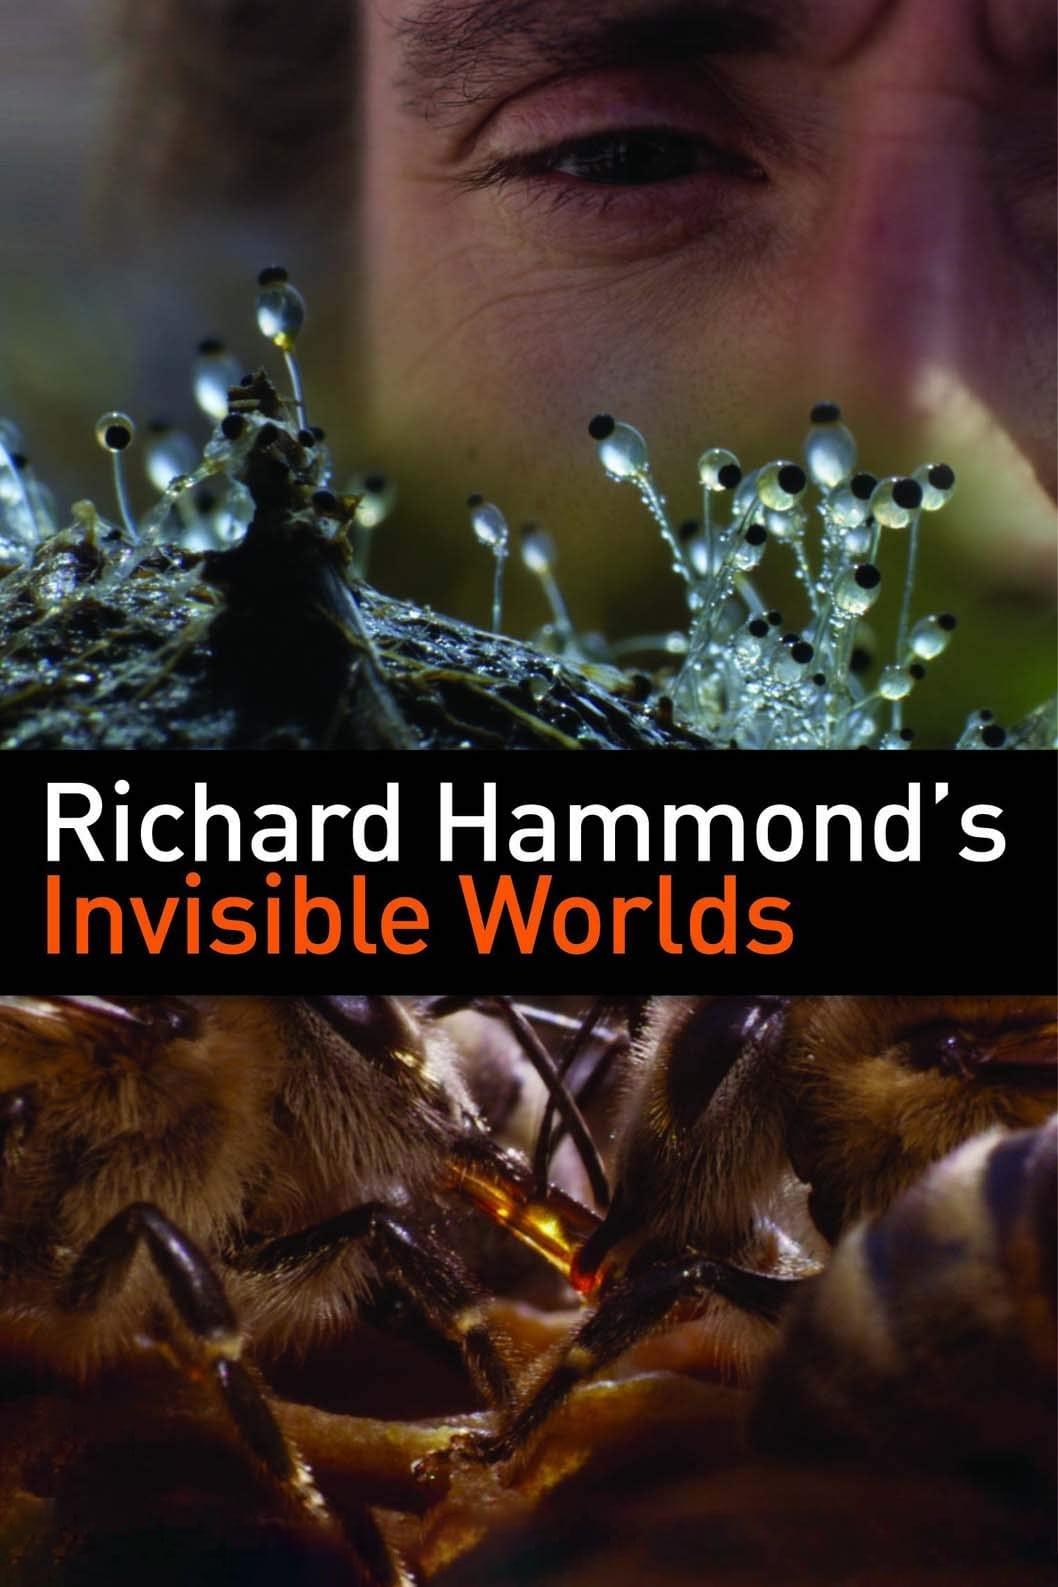 Richard Hammond's Invisible Worlds (2010)